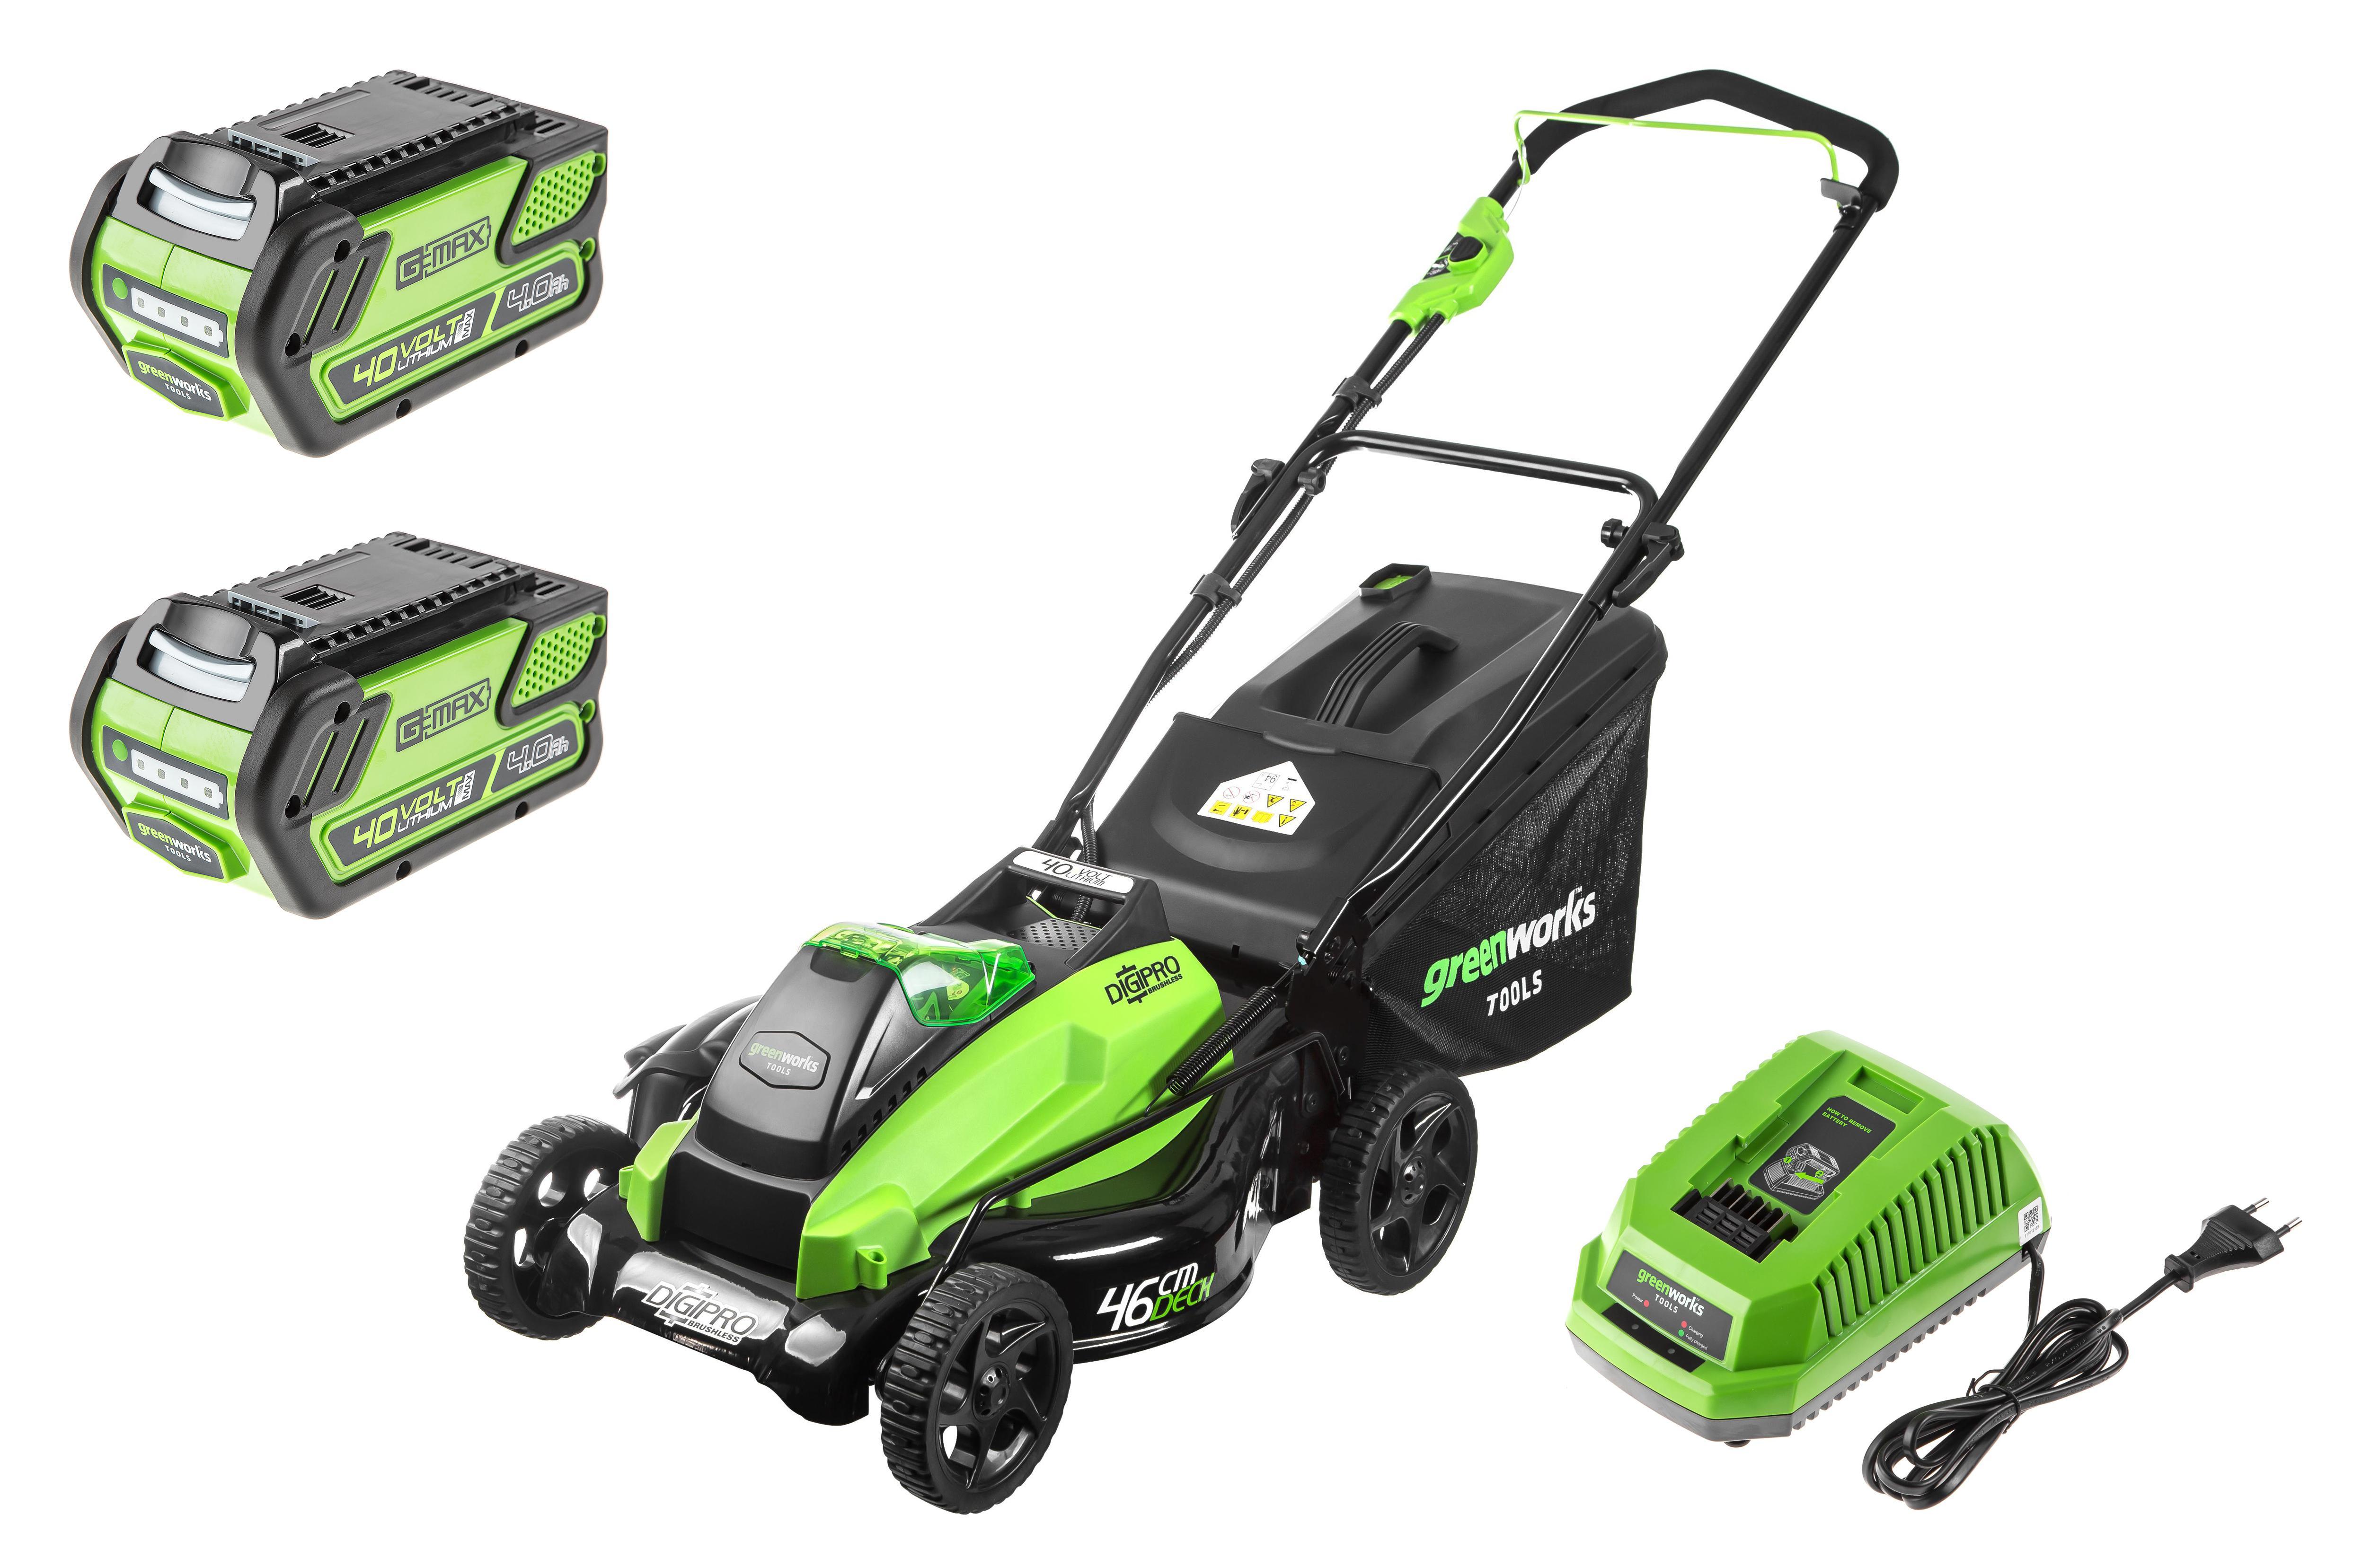 Аккумуляторная газонокосилка Greenworks Gd40lm45k4 (2500407ub) 1акк 40В 4Ач + ЗУ